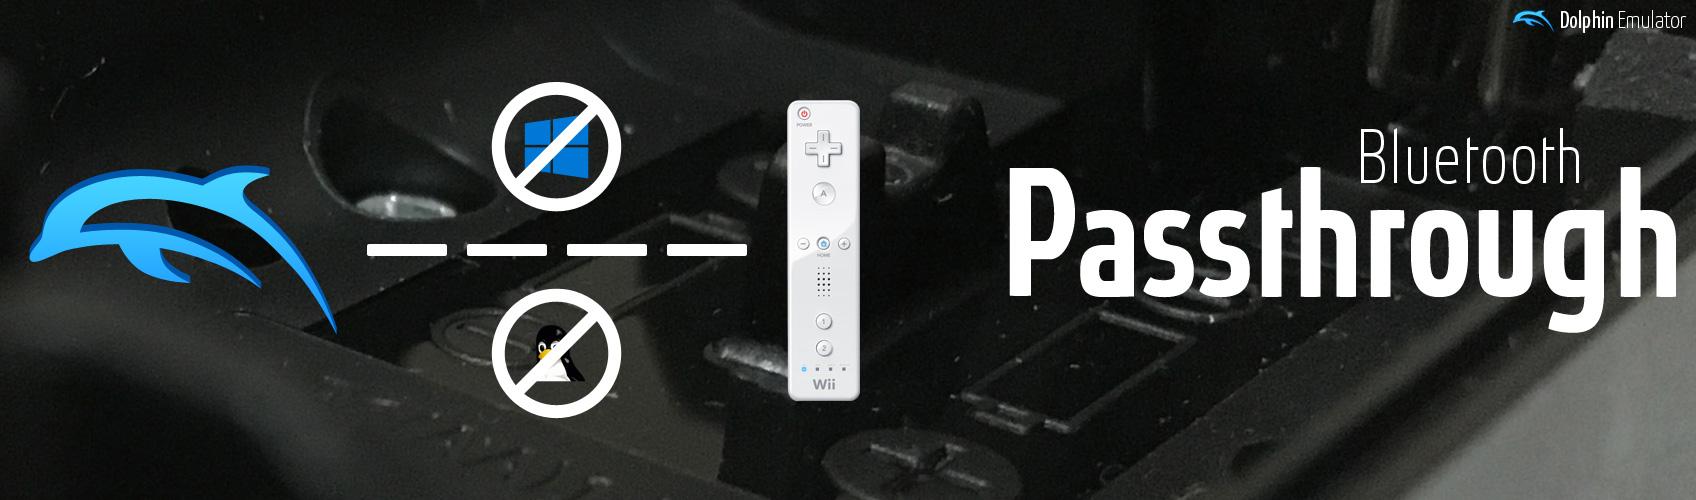 Dolphin Emulator - Bluetooth Passthrough